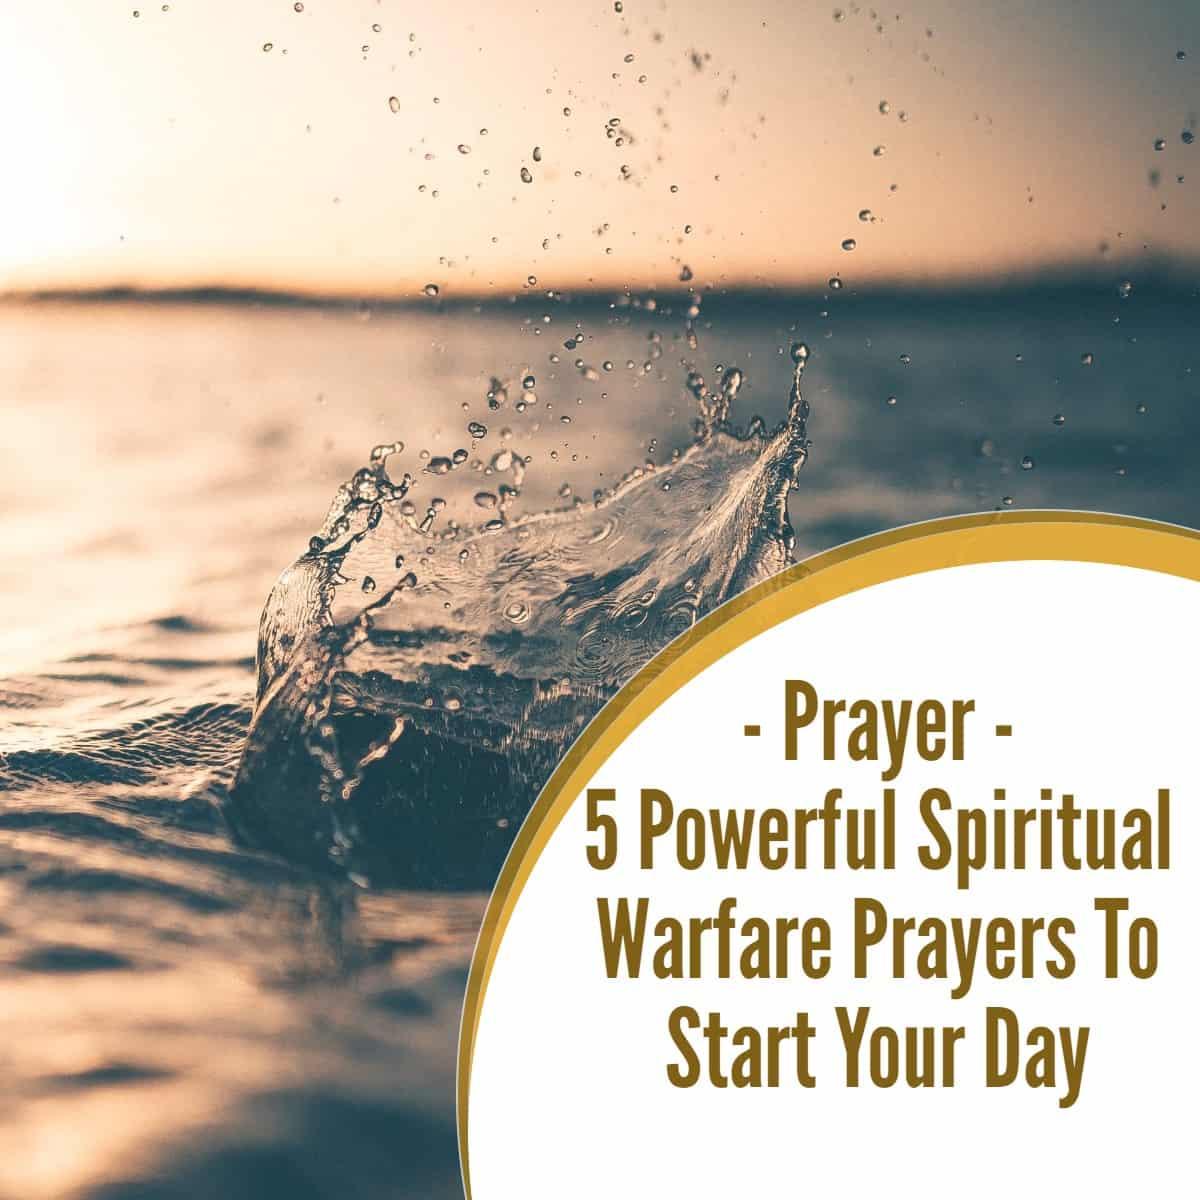 5 Powerful Spiritual Warfare Prayers To Start Your Day